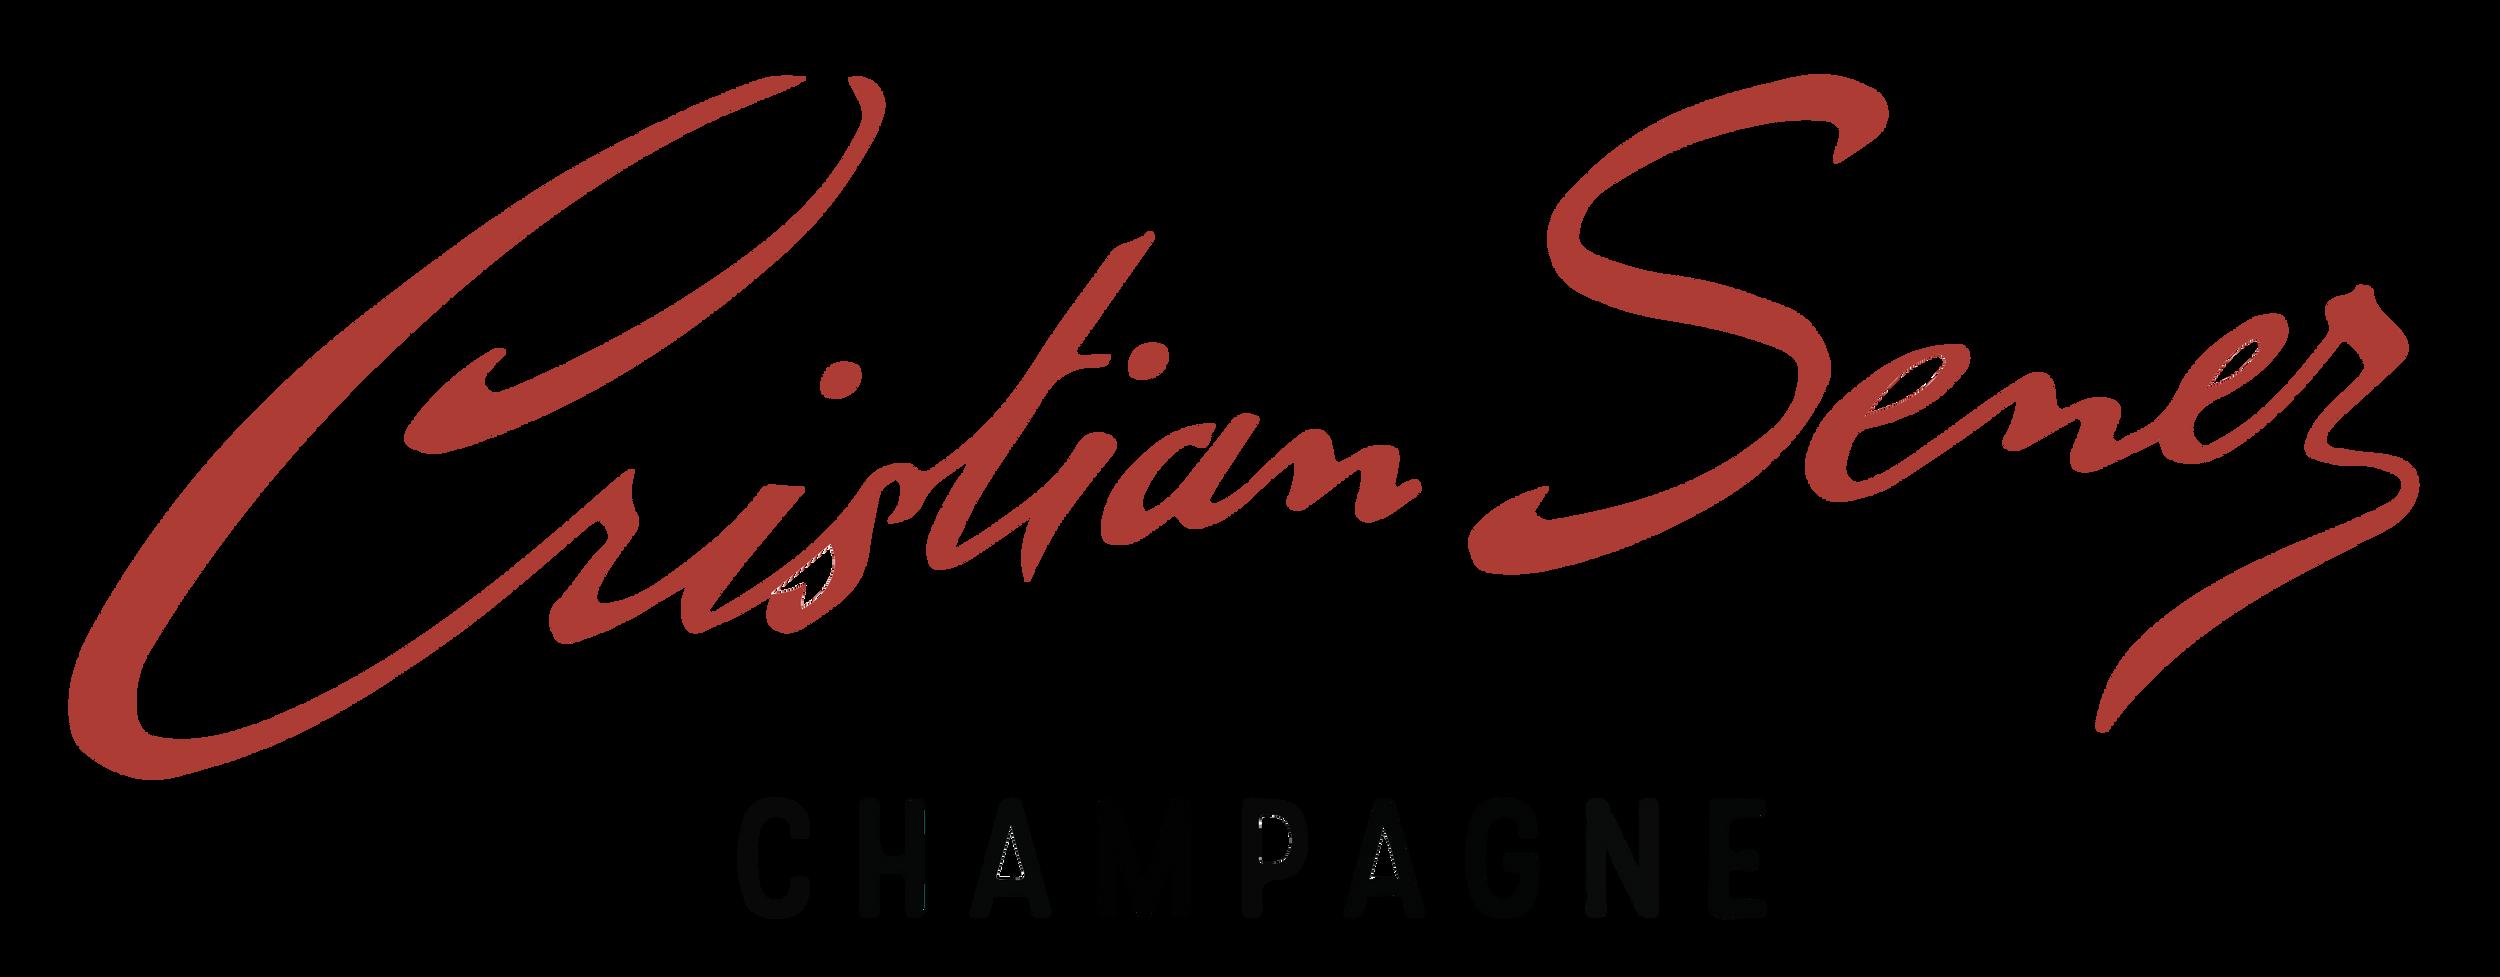 (c) Champagne-senez.com